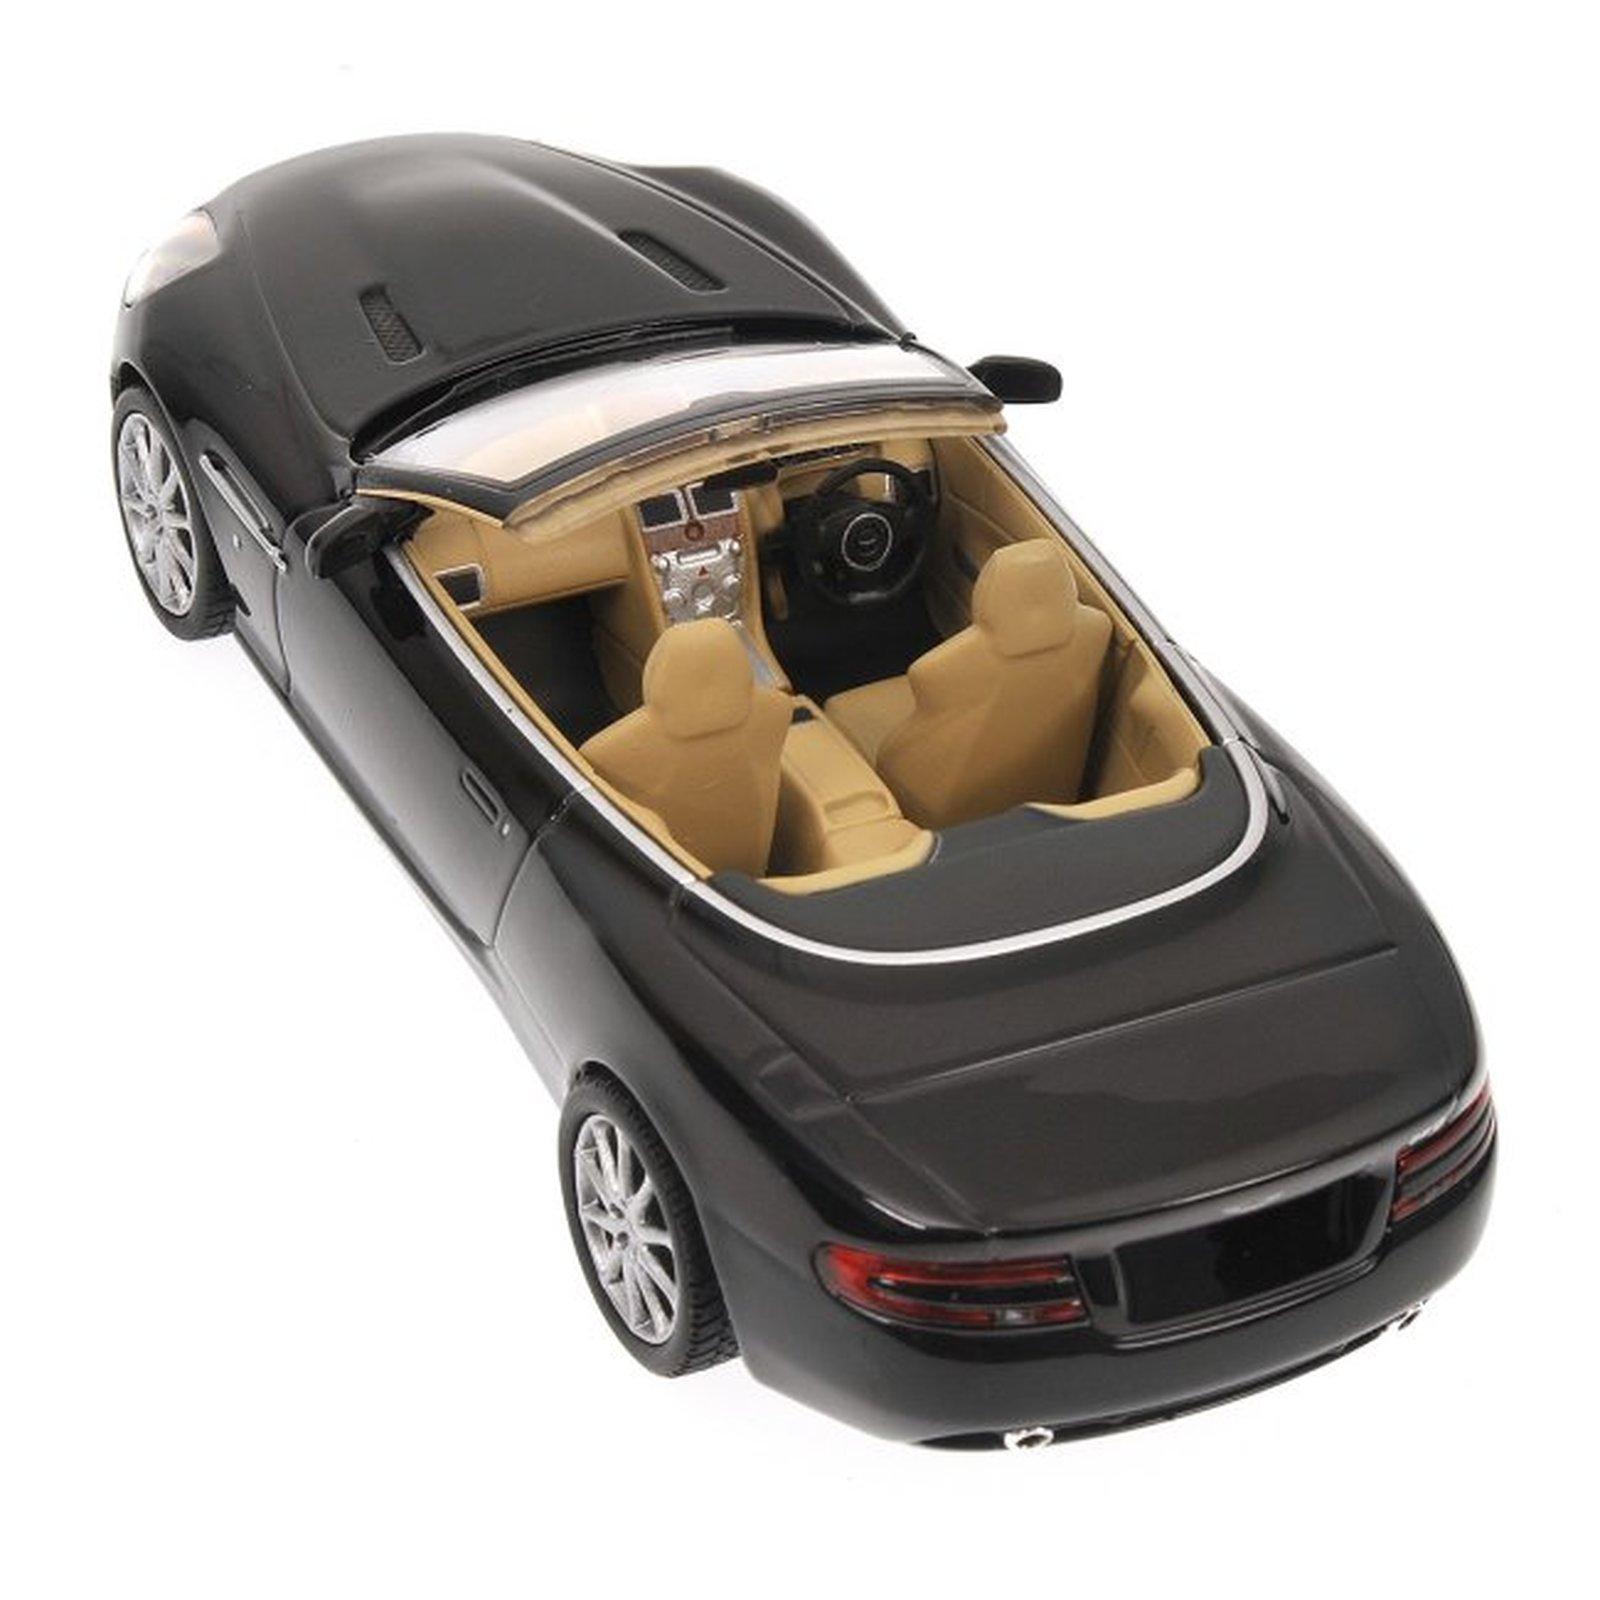 minichamps 400137330 aston martin db9 volante schwarz. Black Bedroom Furniture Sets. Home Design Ideas